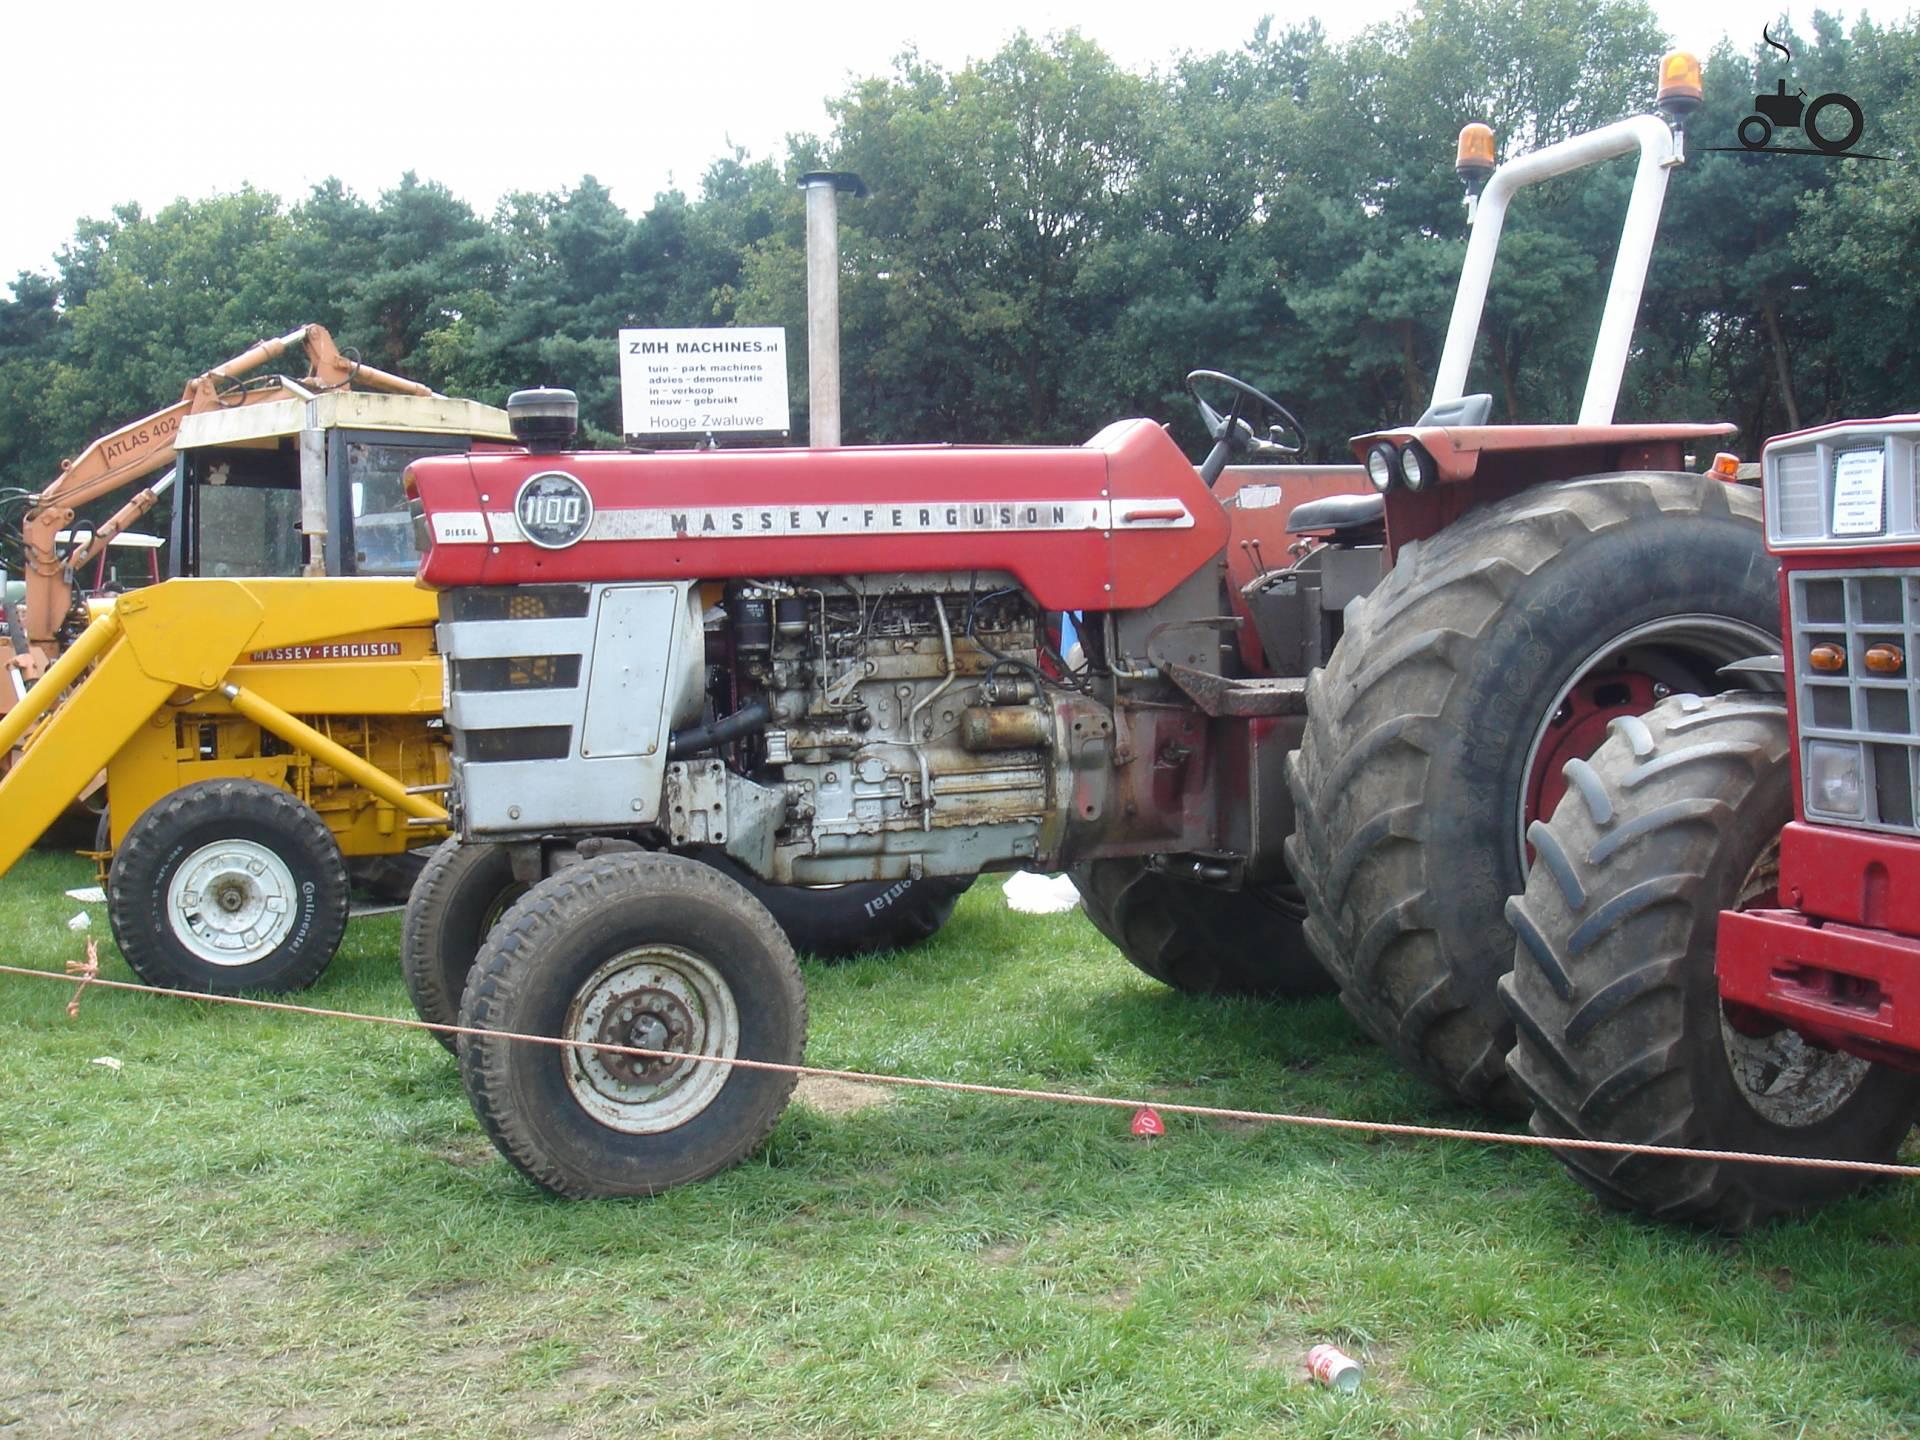 Massey Ferguson 1100 Parts : Massey ferguson wheatland tractor bing images